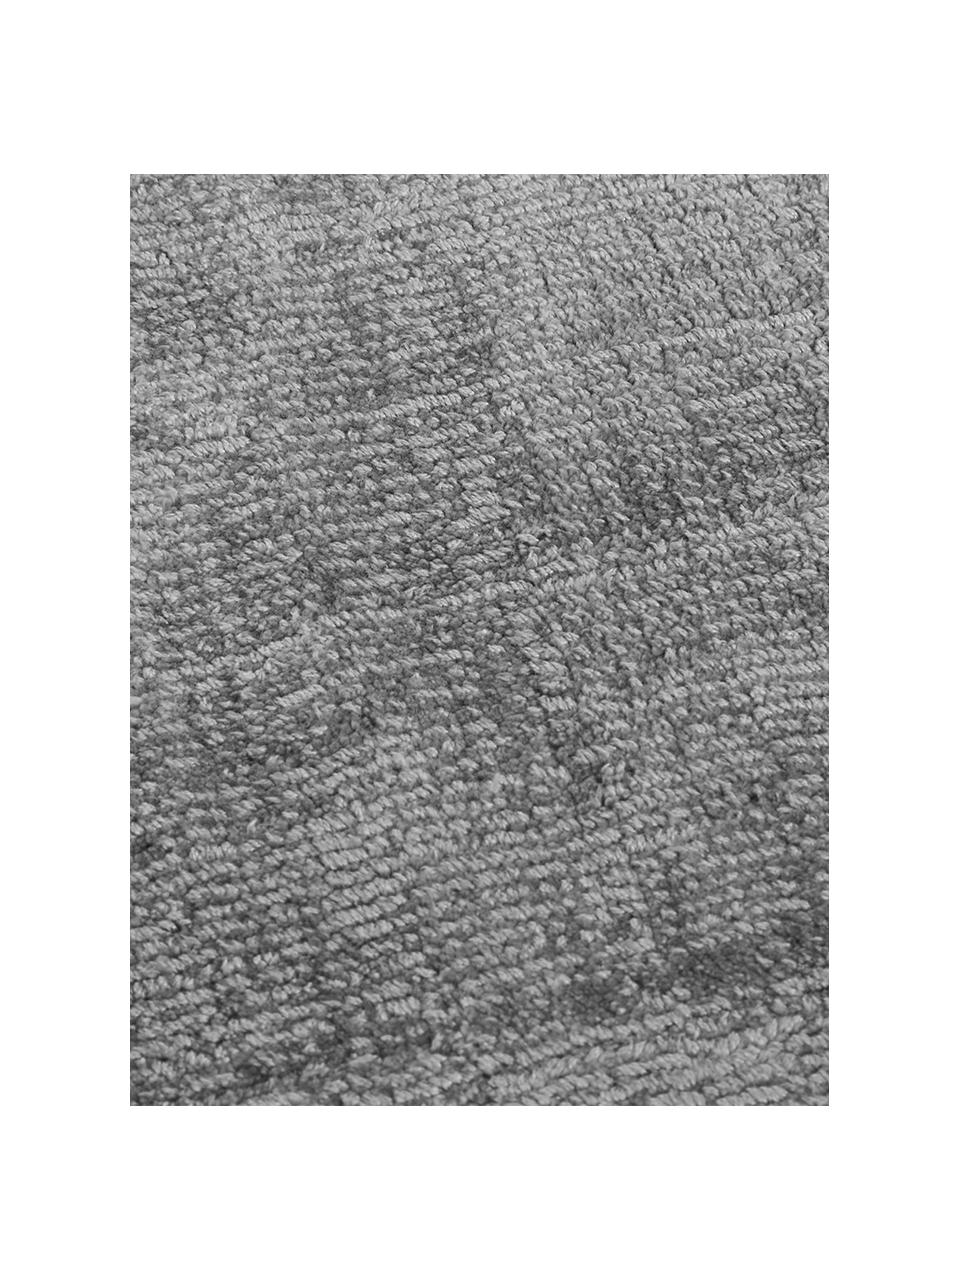 Runder Viskoseteppich Jane in Grau, handgewebt, Flor: 100% Viskose, Grau, Ø 200 cm (Größe L)